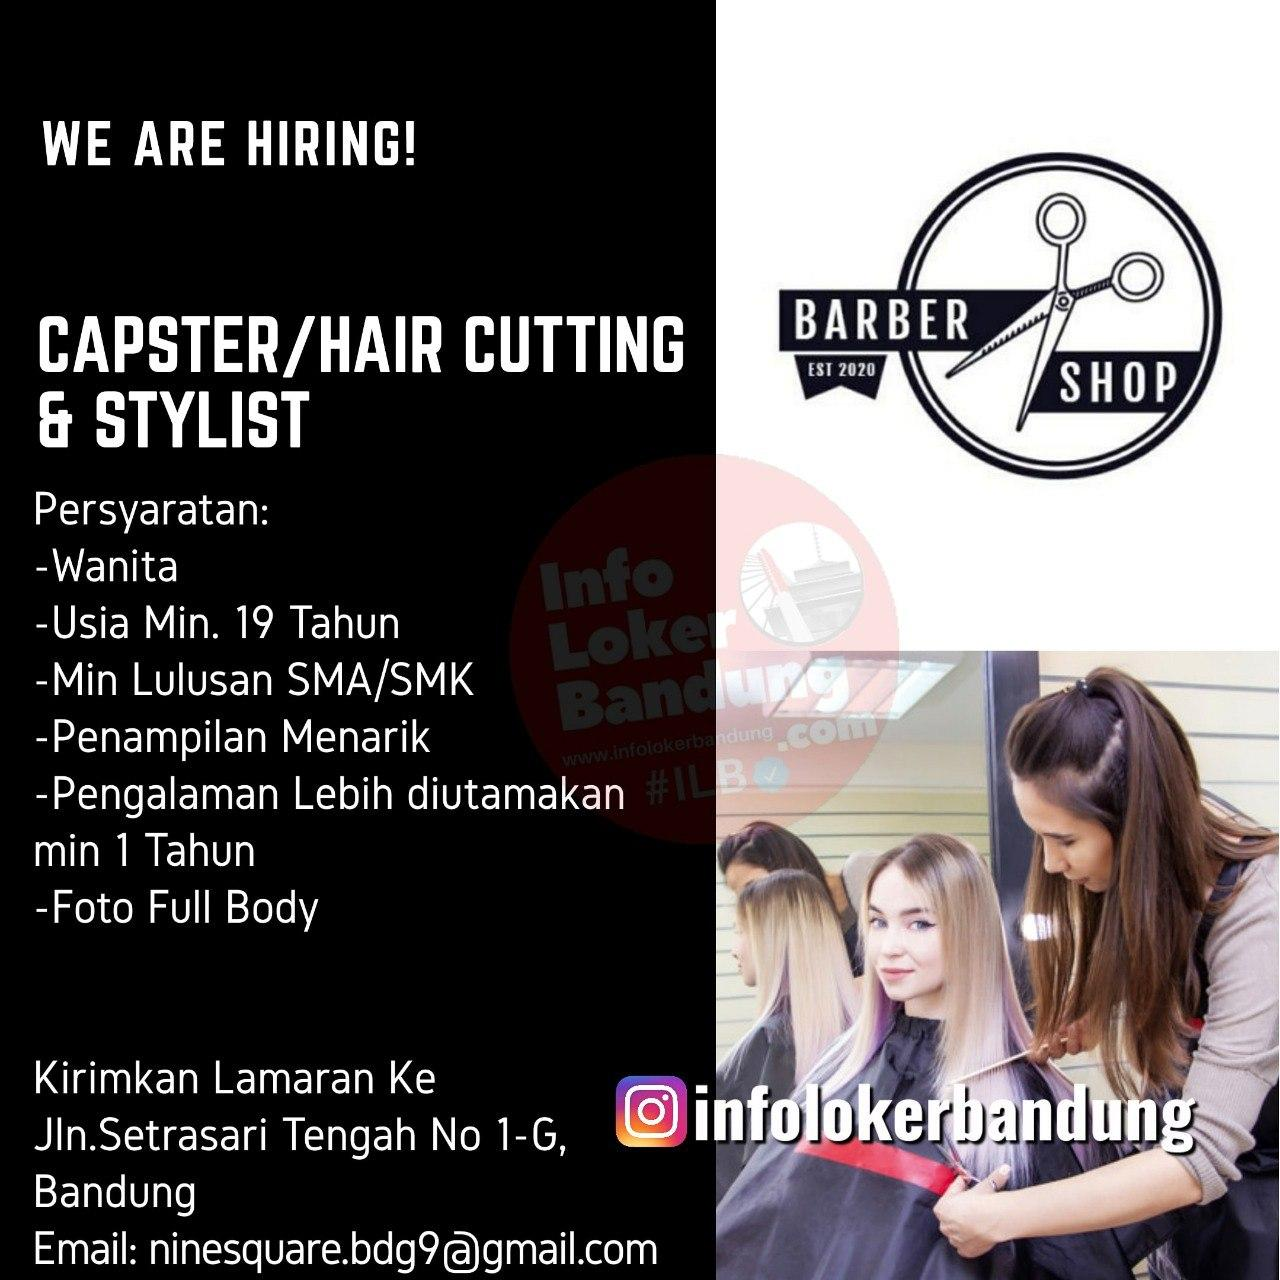 Lowongan Kerja Capster / Hair Cutting & Stylist Bandung Agustus 2020